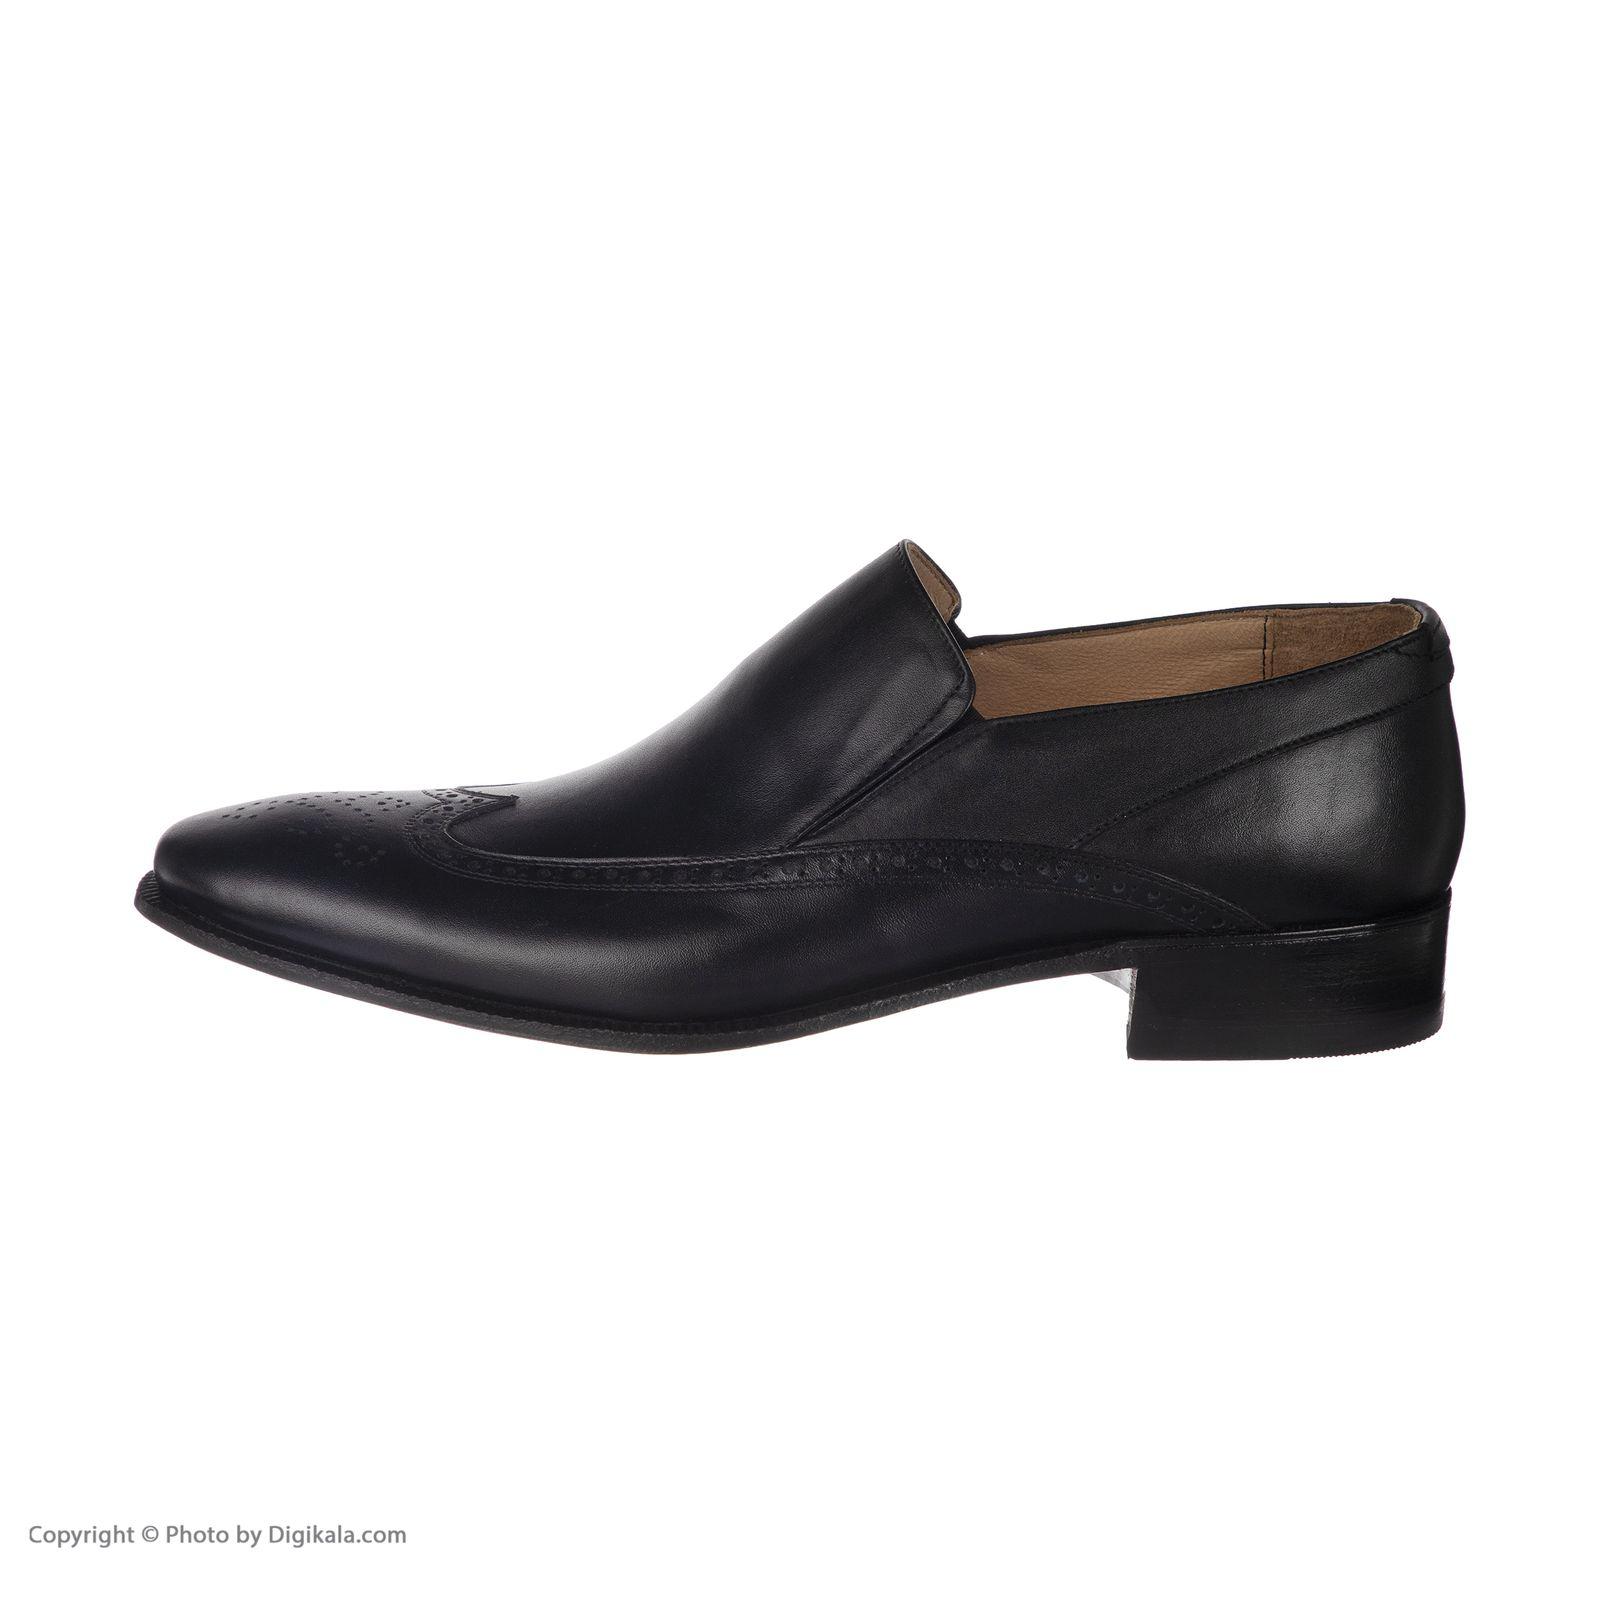 کفش مردانه نظری کد 435 -  - 1